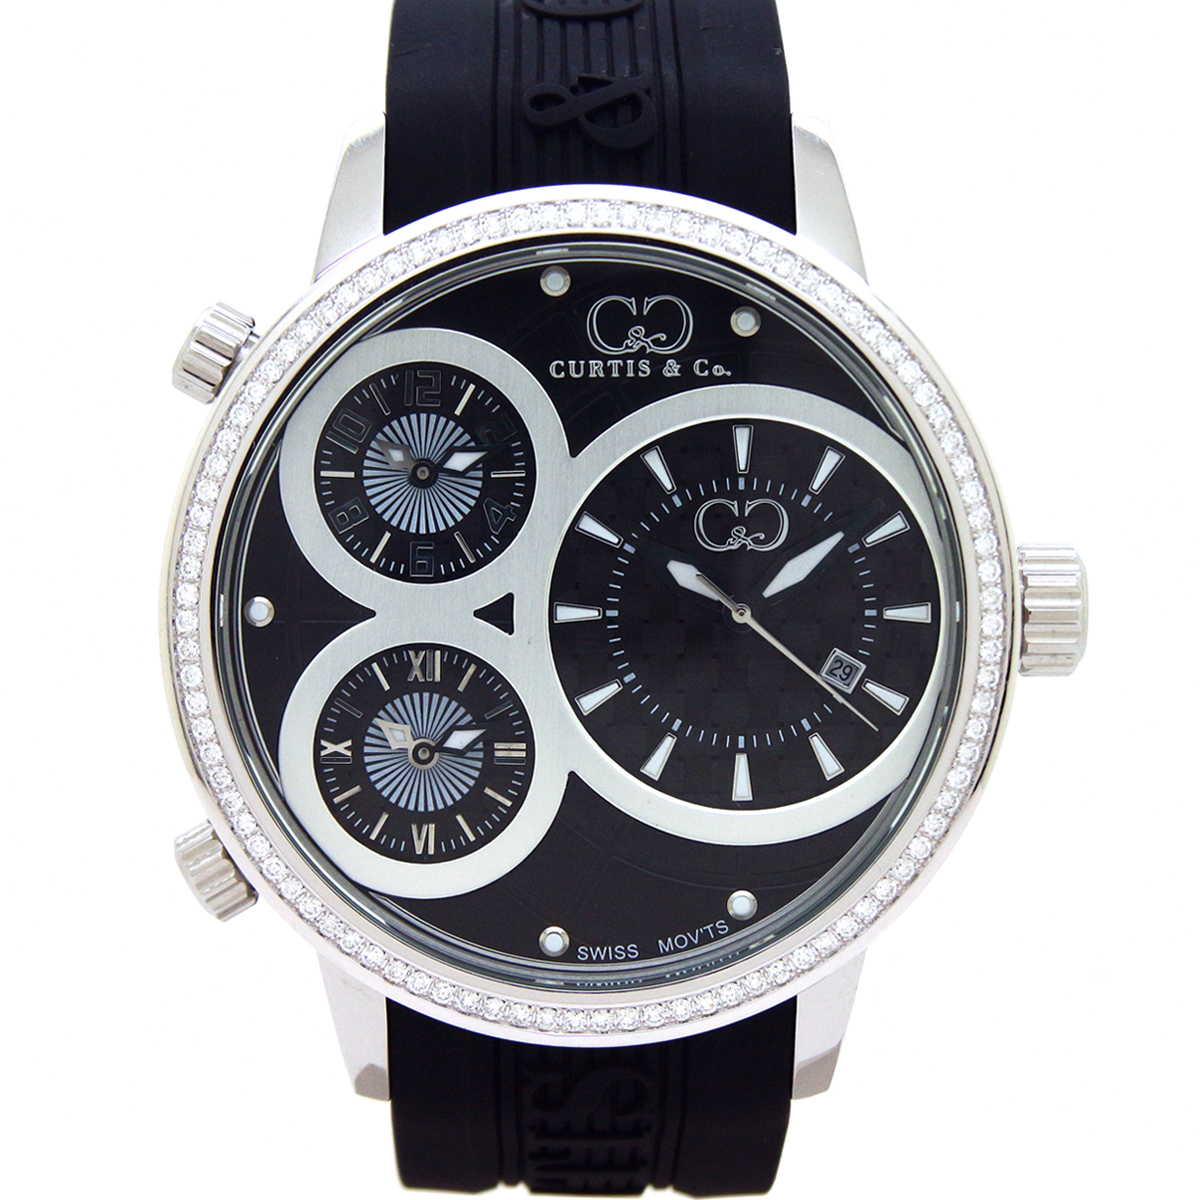 CURTIS&Co(カーティス)BIG TIME WORLD 50mm(Black) カーティス ビックタイムワールド50mm ダイヤモンド【腕時計】